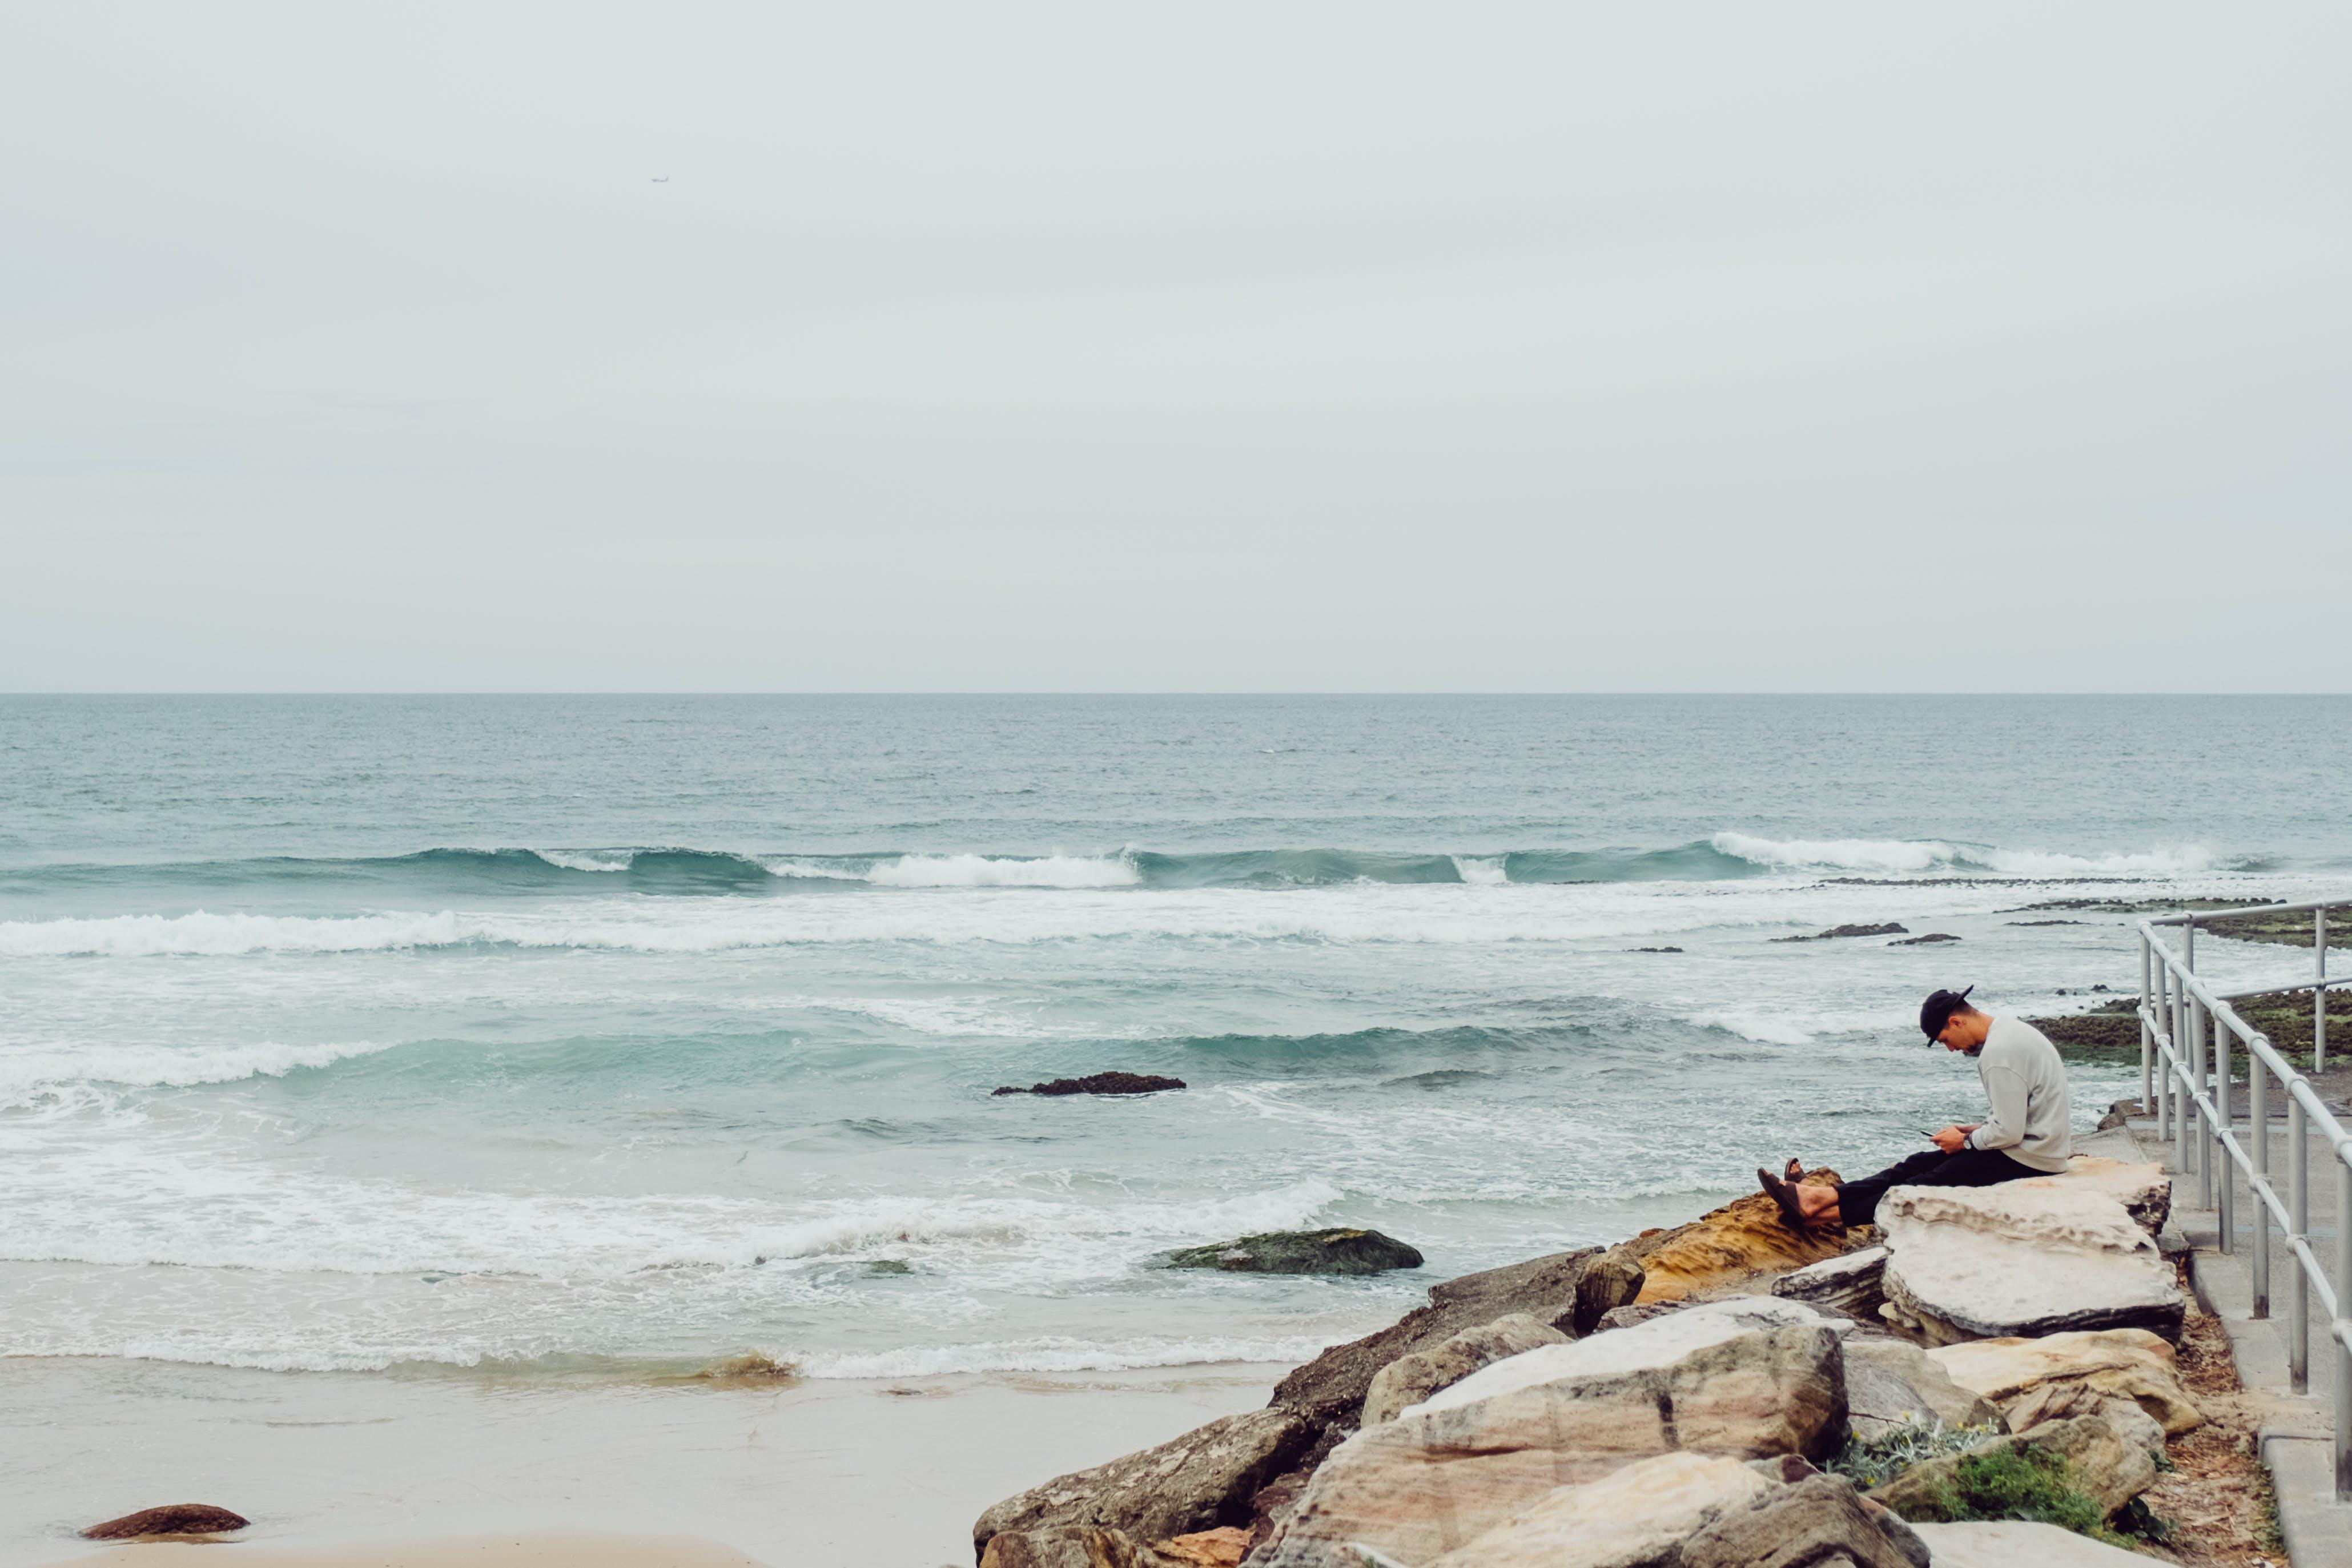 Gratis stockfoto met golven, h2o, iemand, kerel